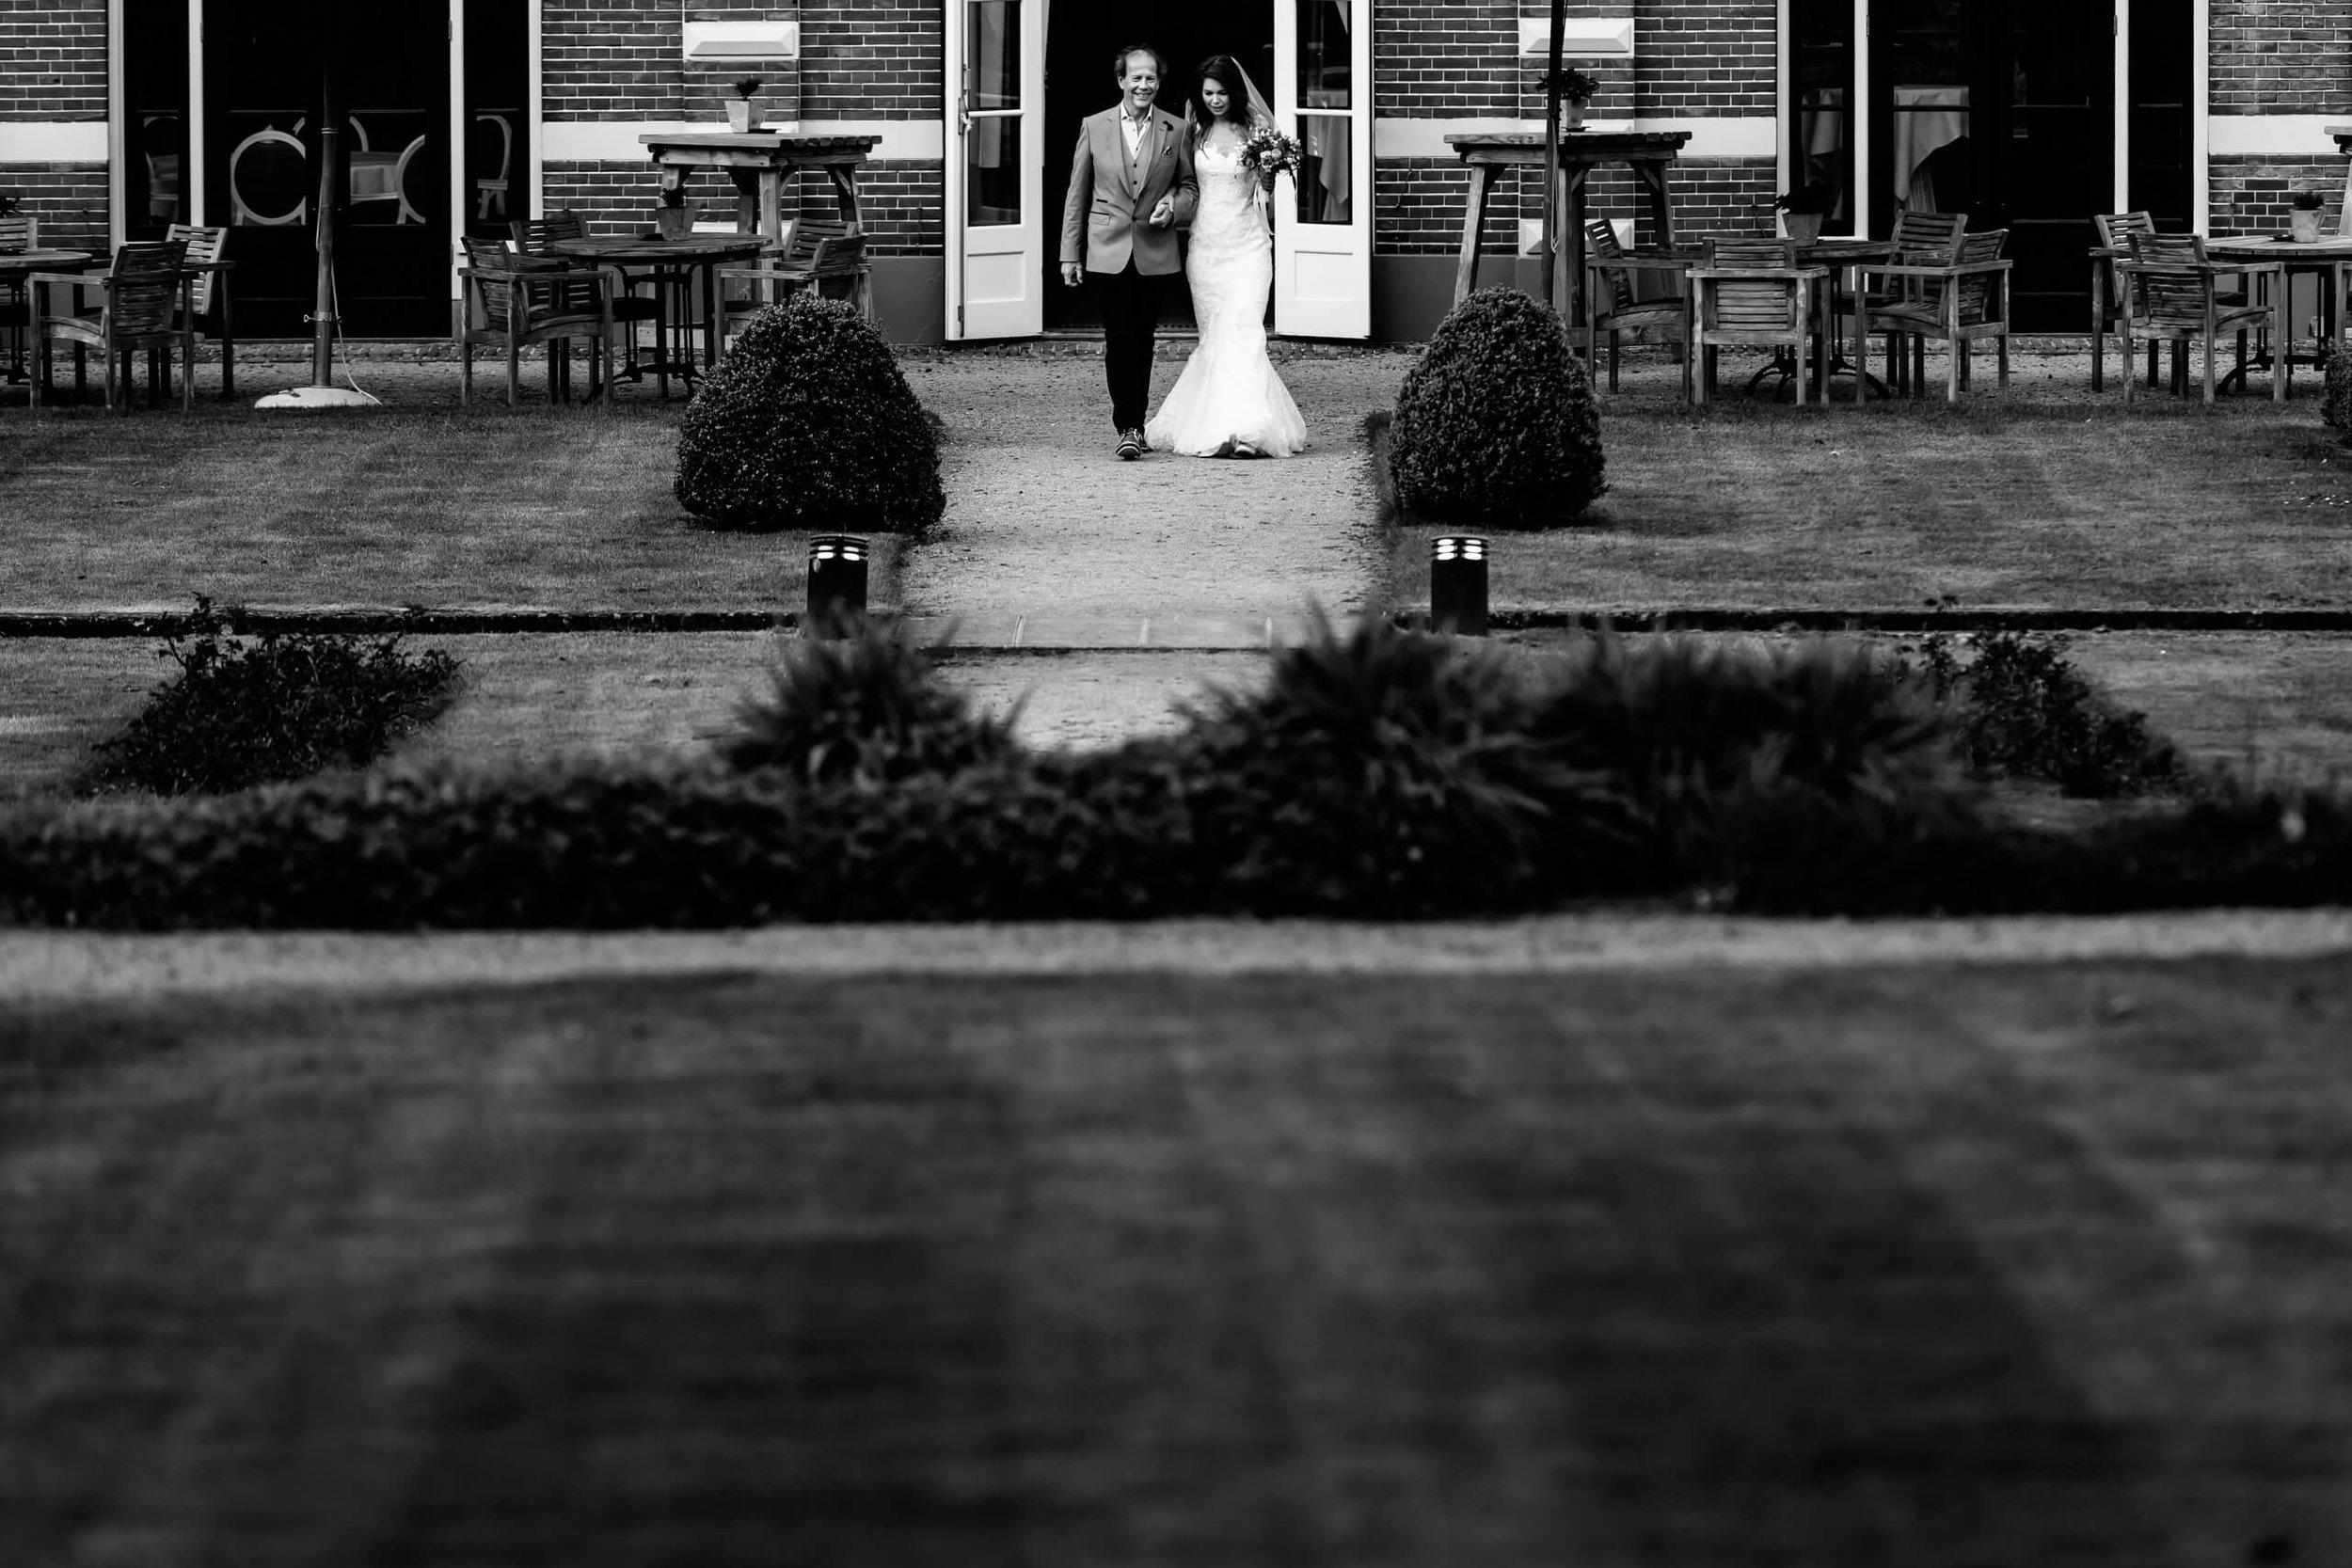 bruidsfotograaf-landgoed-groot-warnsborn-8.jpg